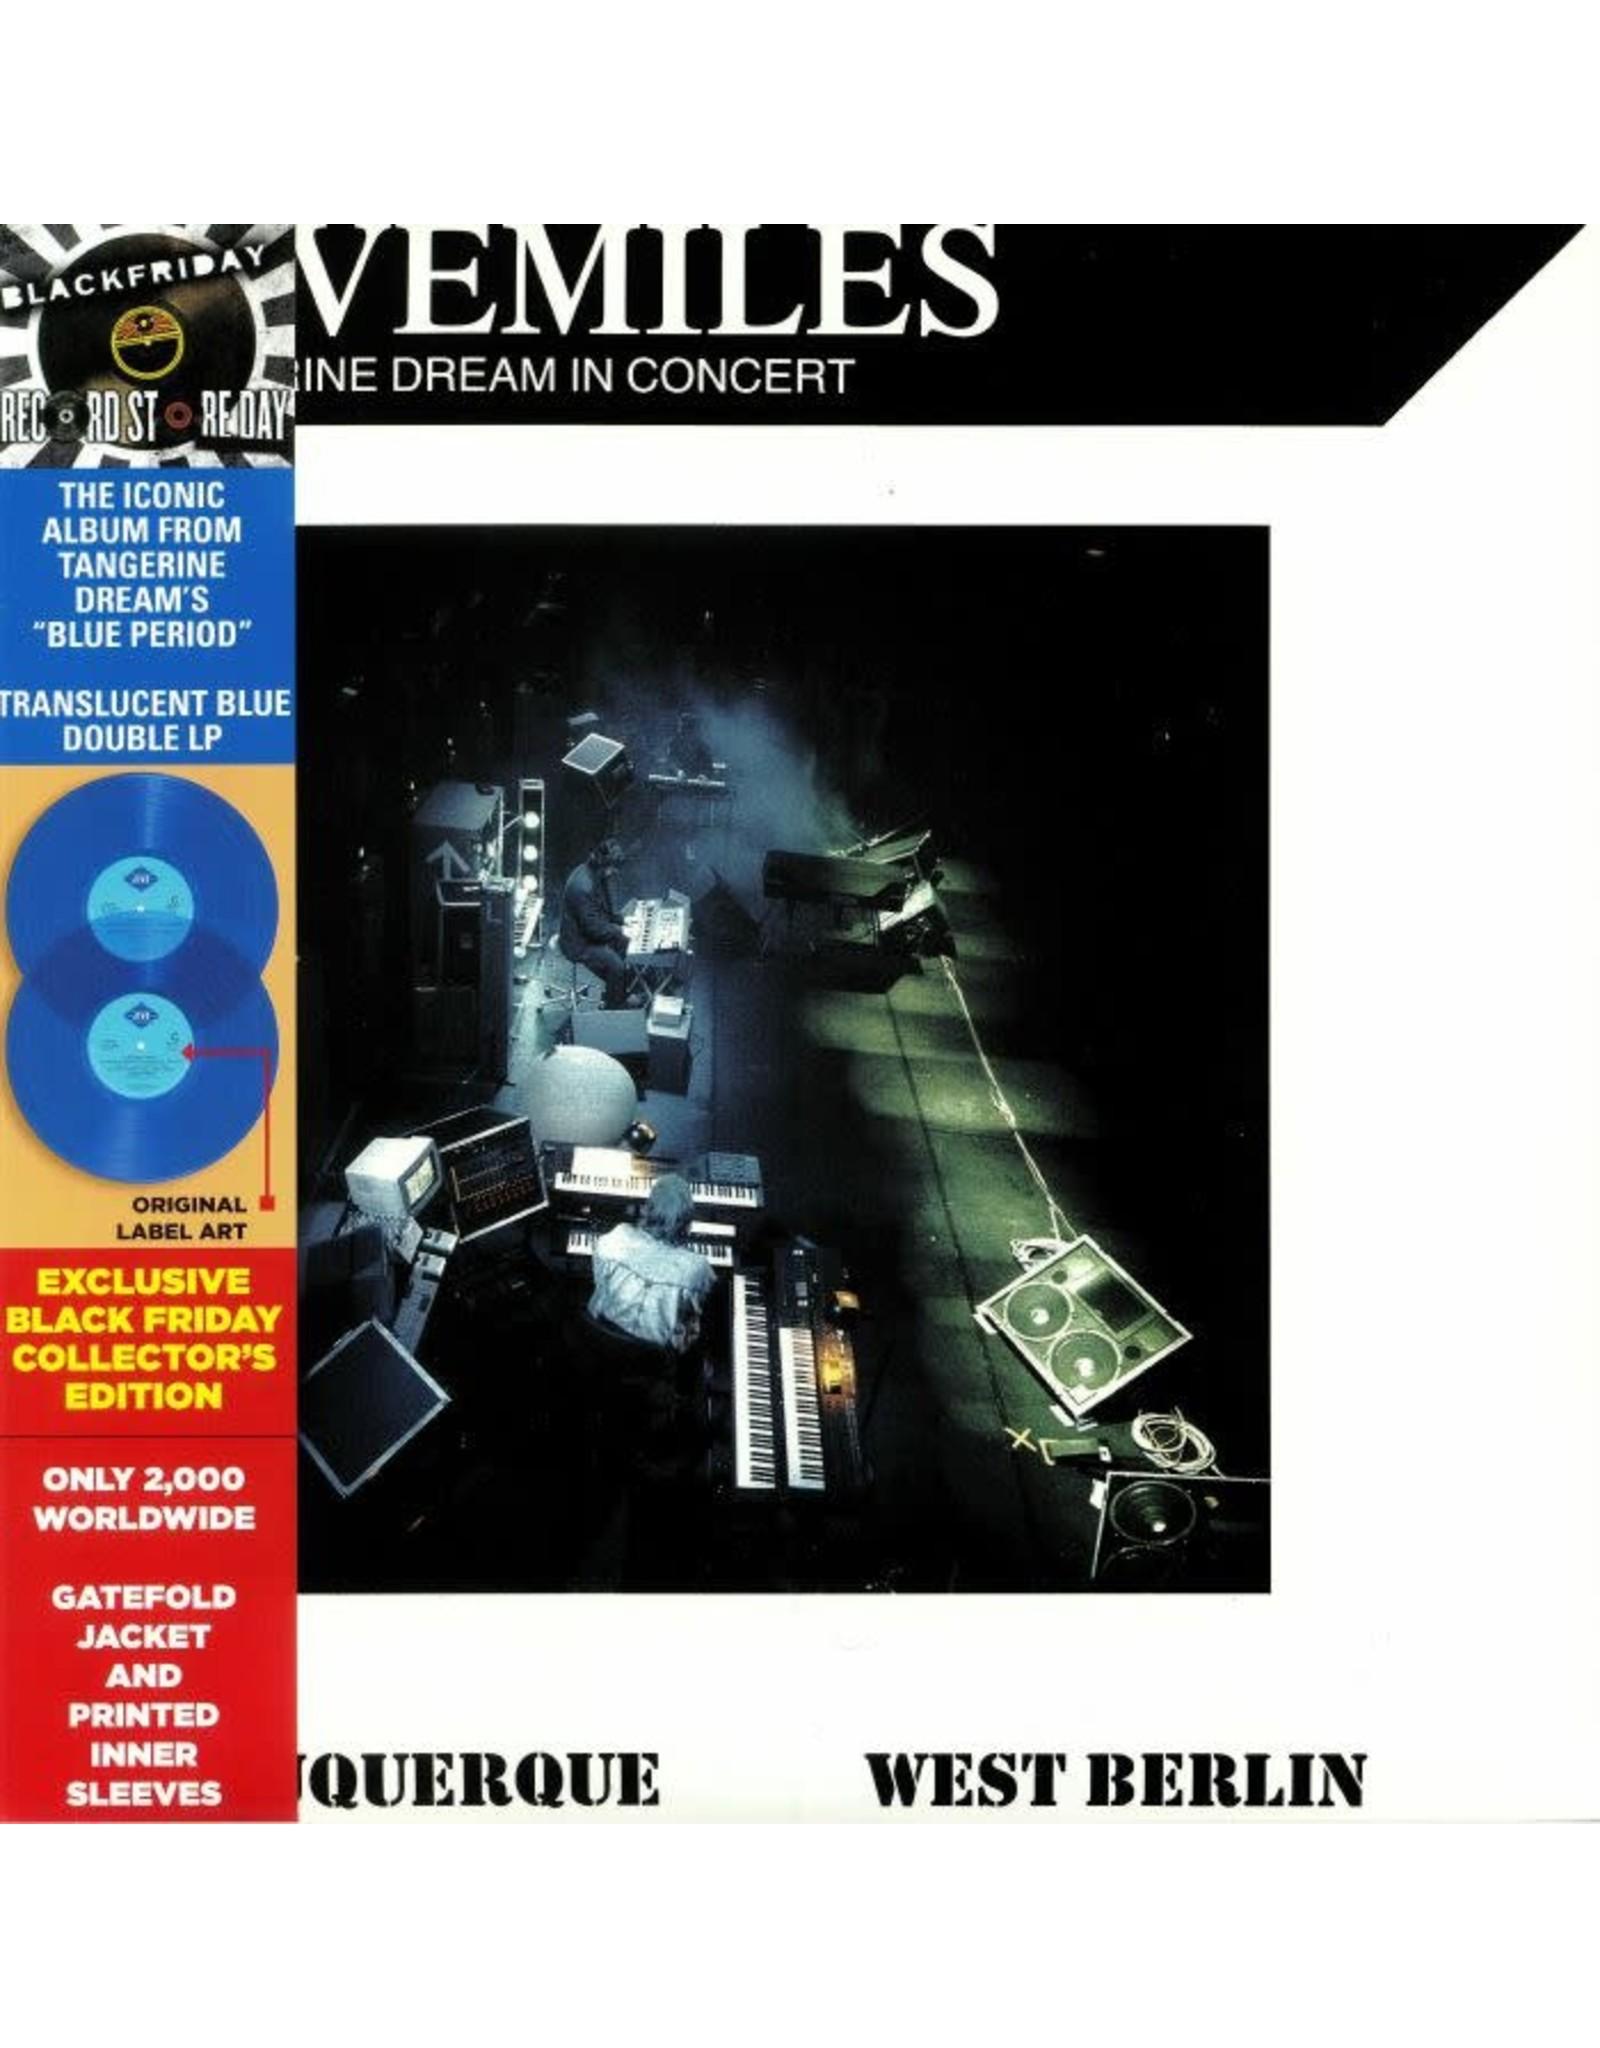 Vinyl Tangerine Dream - Livemiles